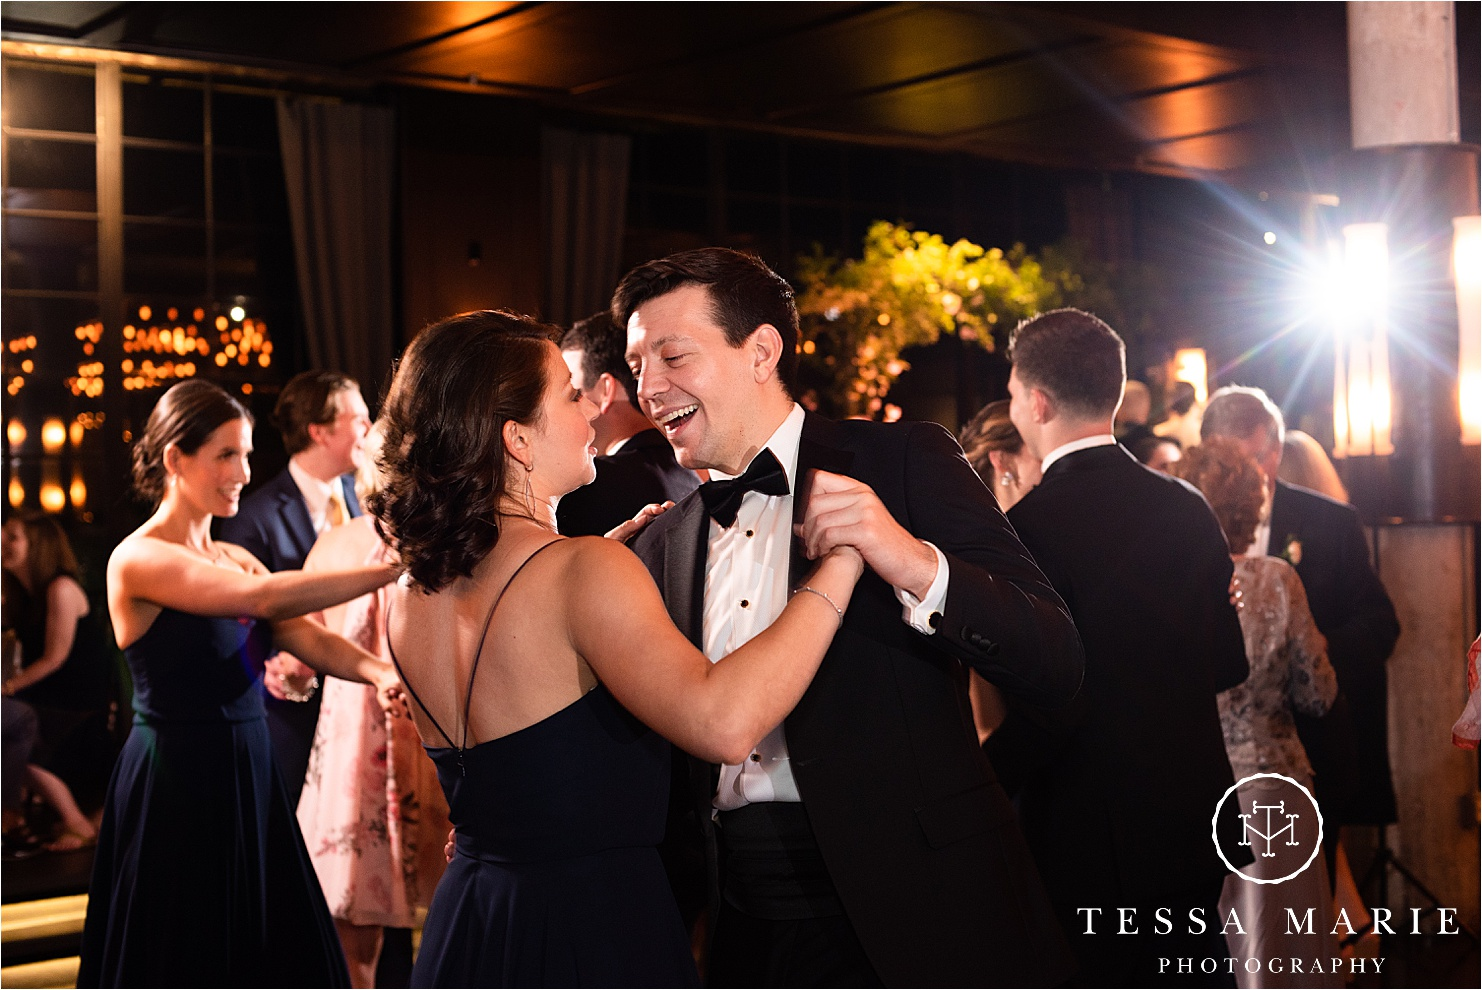 Tessa_marie_weddings_houston_wedding_photographer_The_astorian_0174.jpg